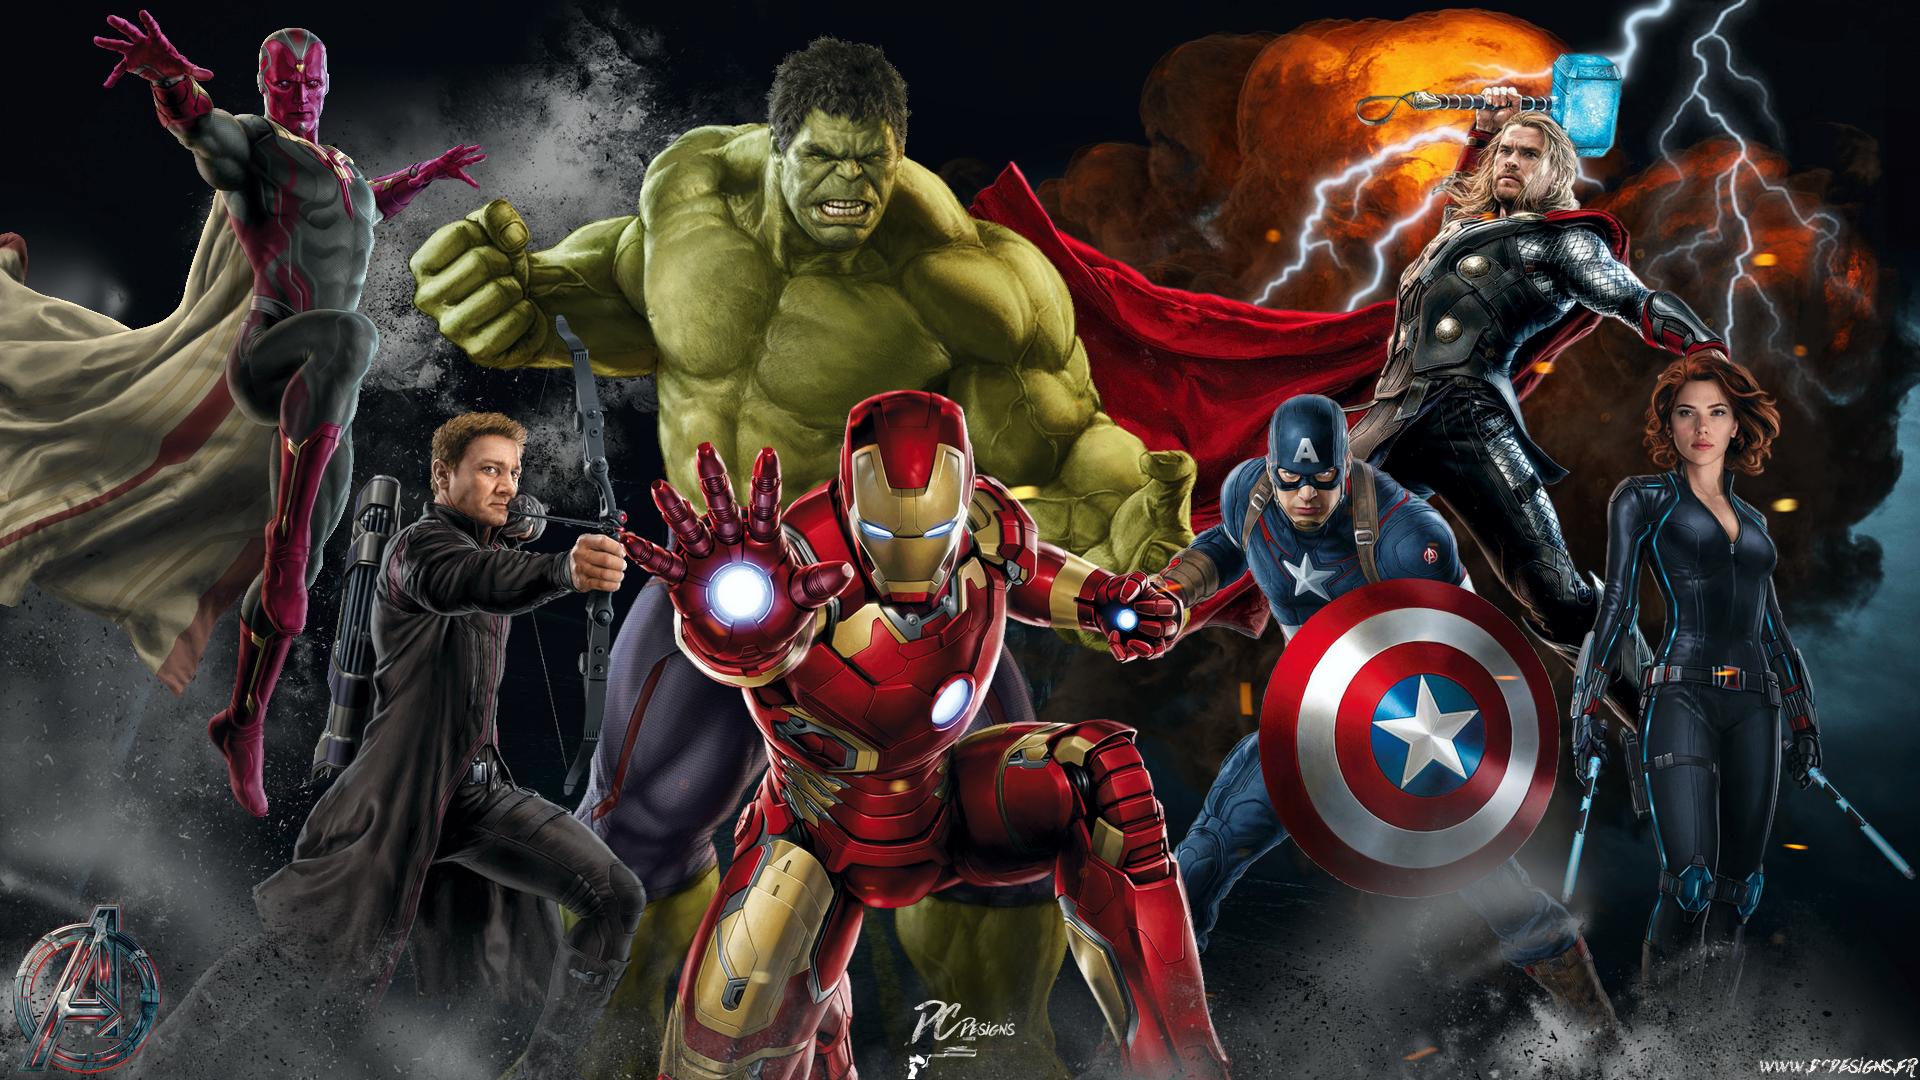 Los Vengadores, Fondos De Pantalla, The Avengers Wallpapers